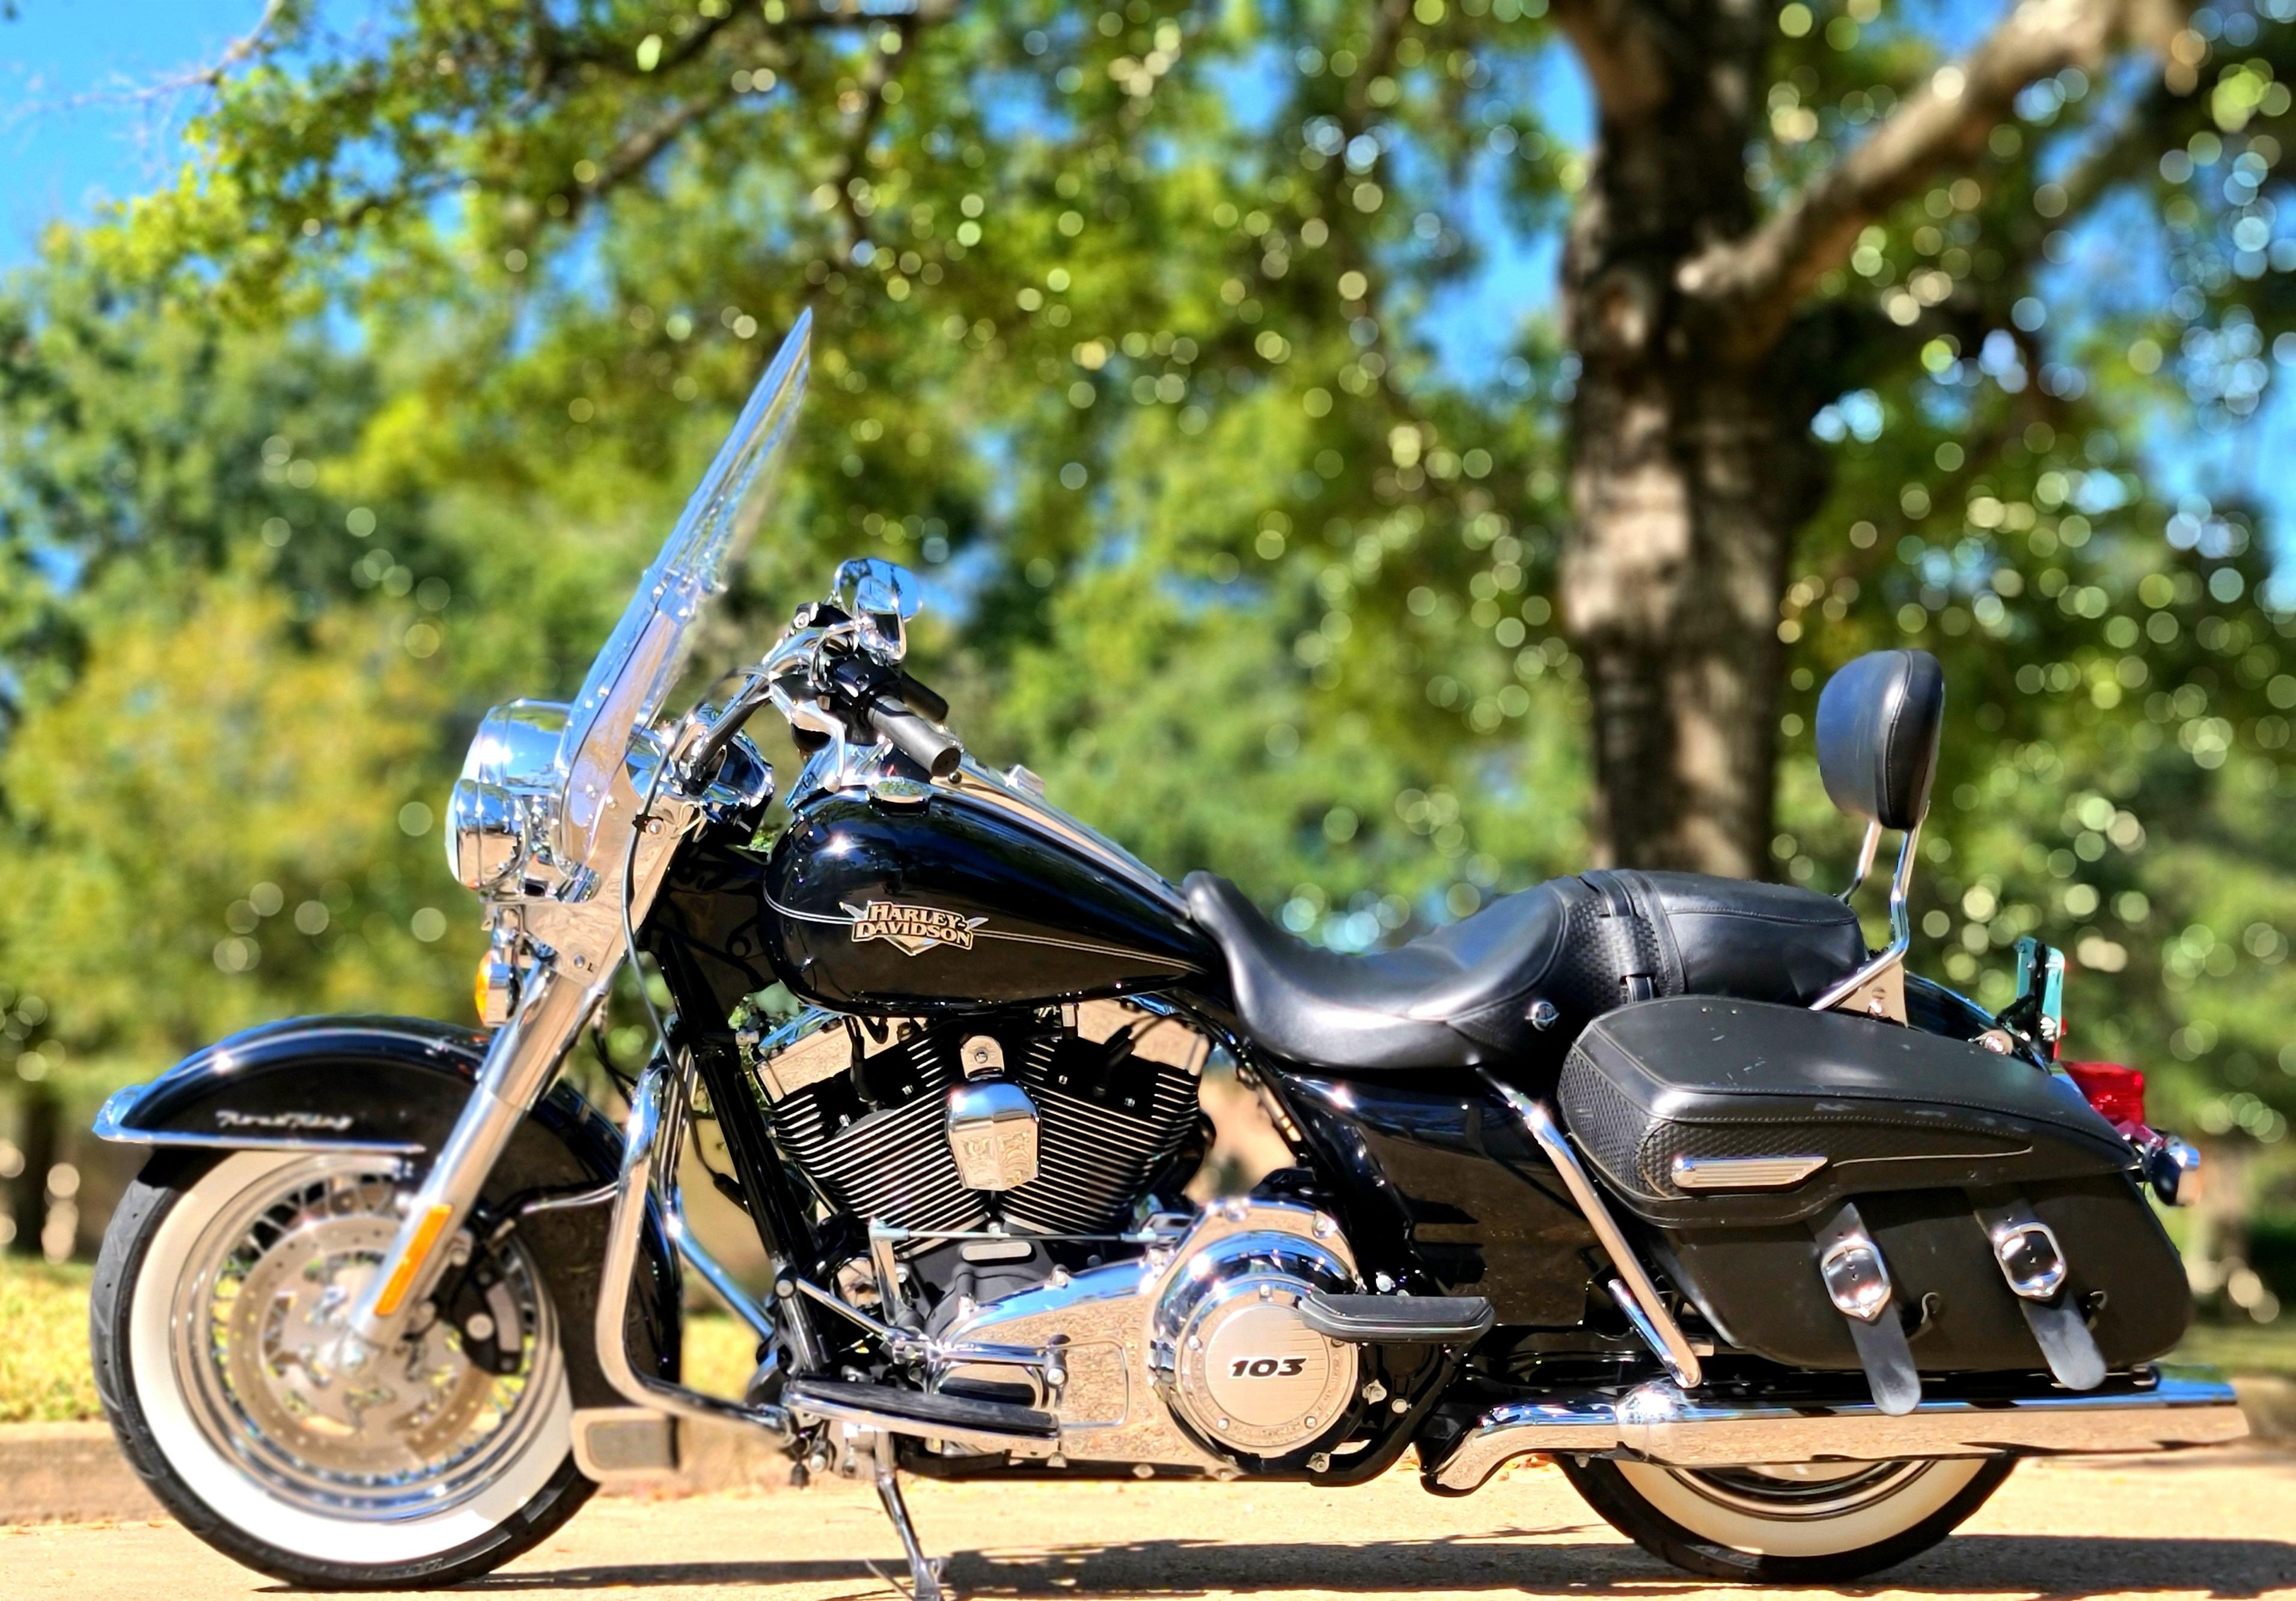 Photo 2013 Harley-Davidson ROAD KING CLASSIC $10800228.96228.96